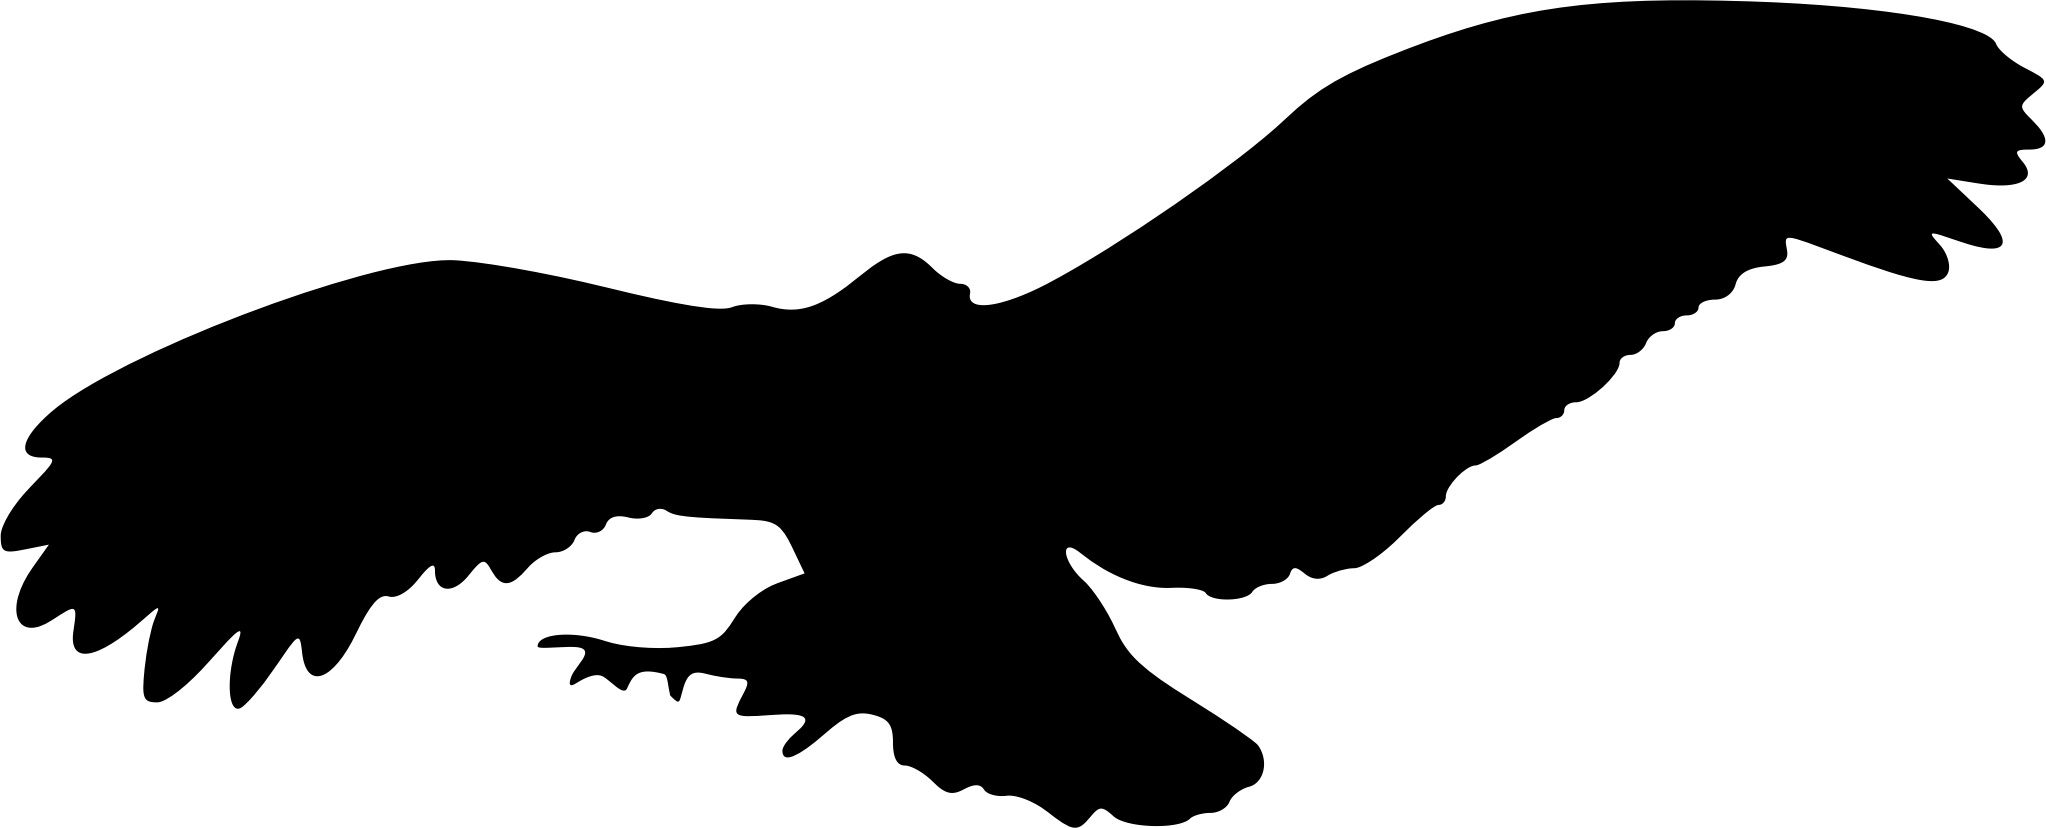 Black Eagle clipart silhouette 7 silhouette Clipart 7 Eagle